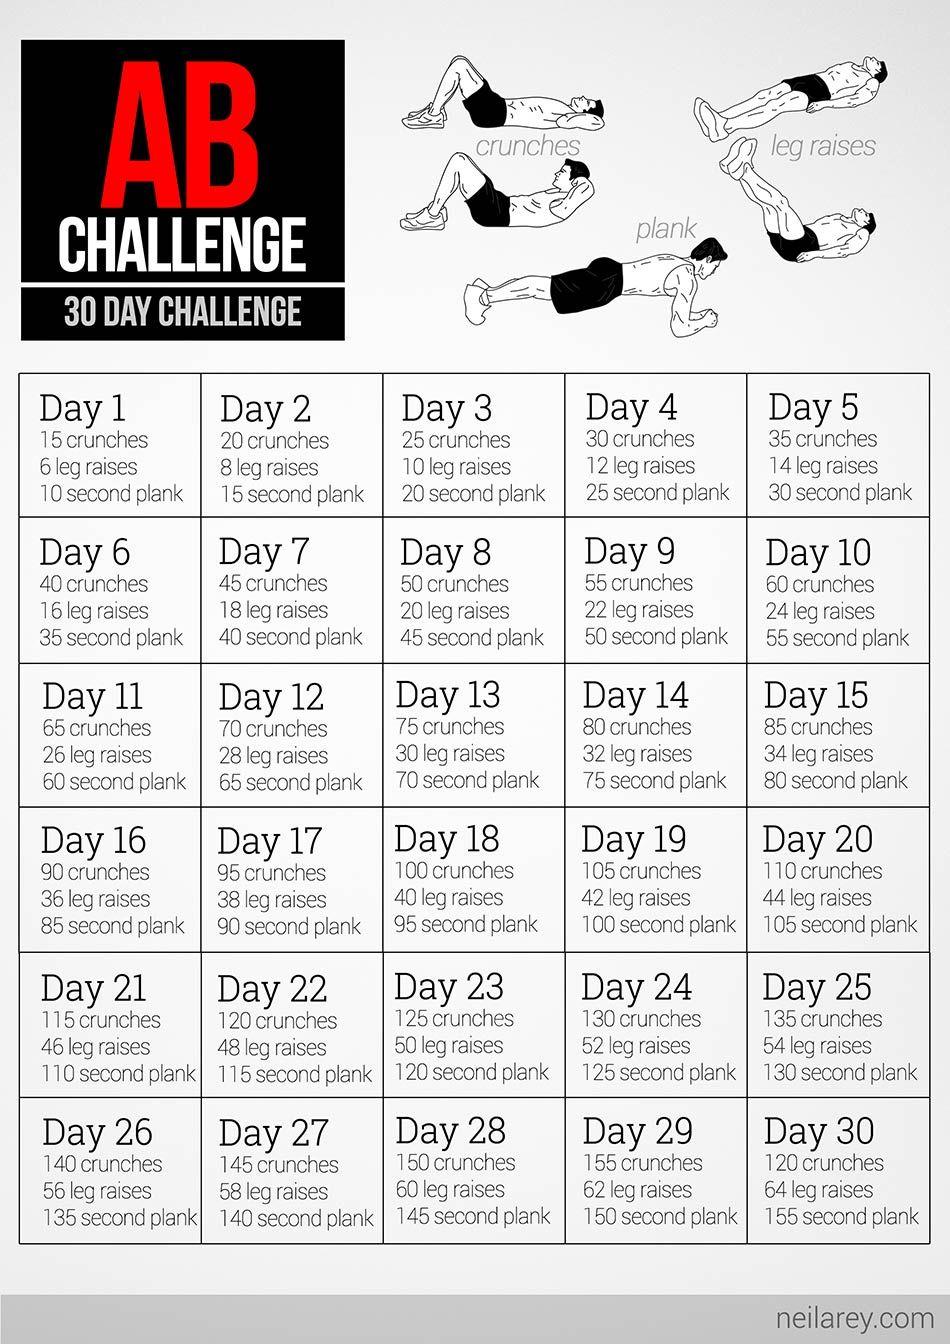 AB CHALLENGE! | Energy Hacks | Pinterest | Ab challenge, Cardio ...